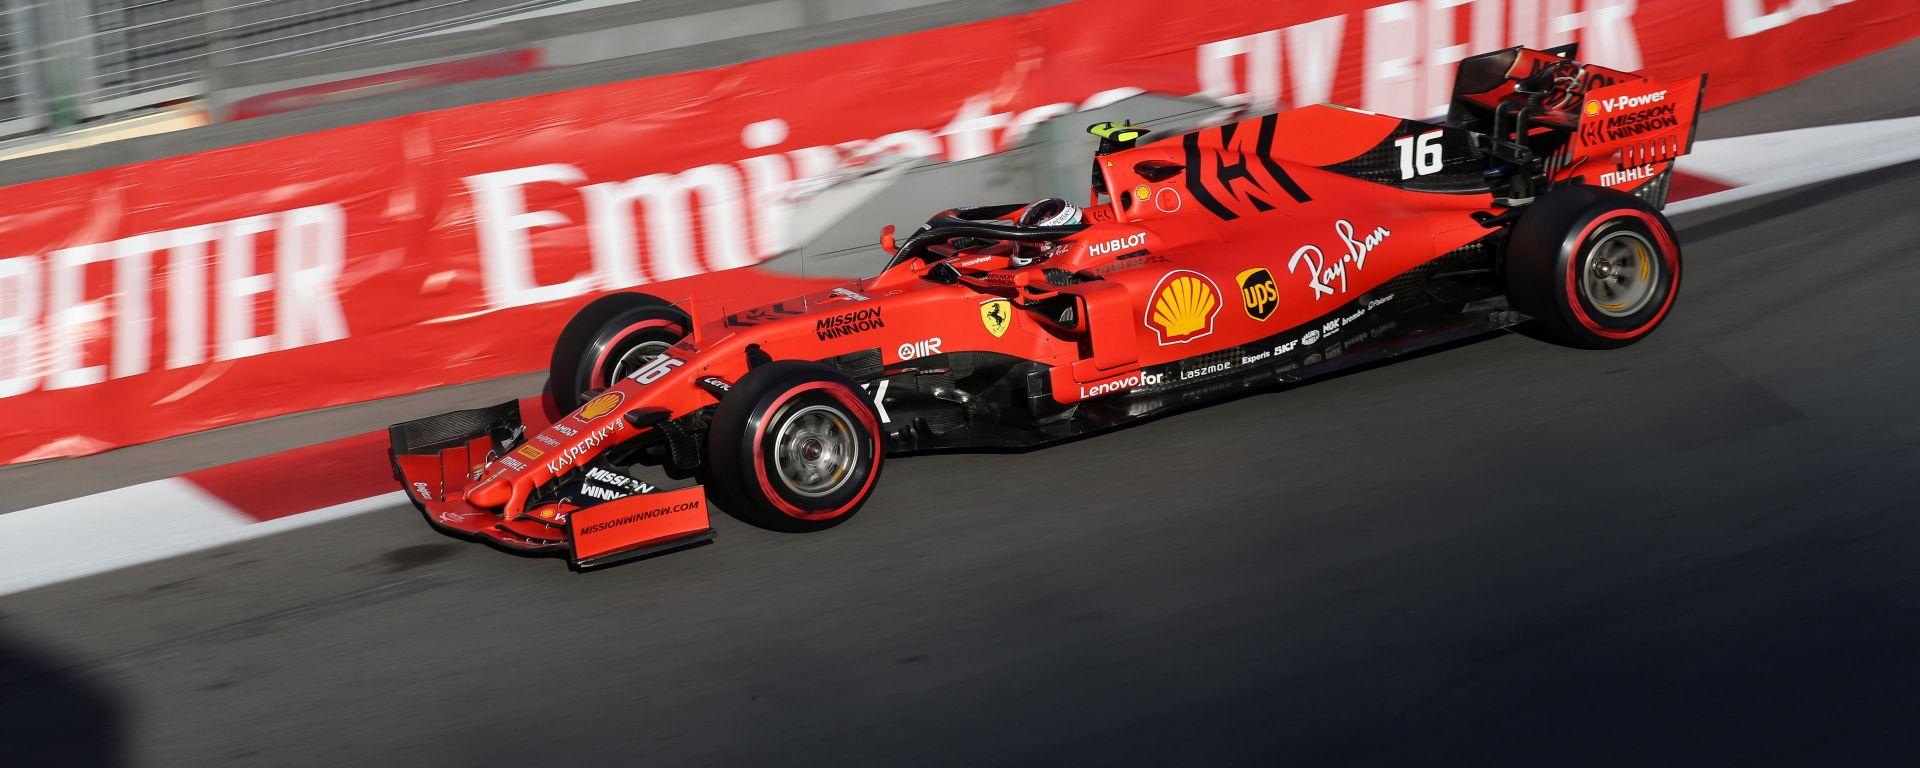 F1 GP Azerbaijan 2019, Charles Leclerc è leader delle PL3